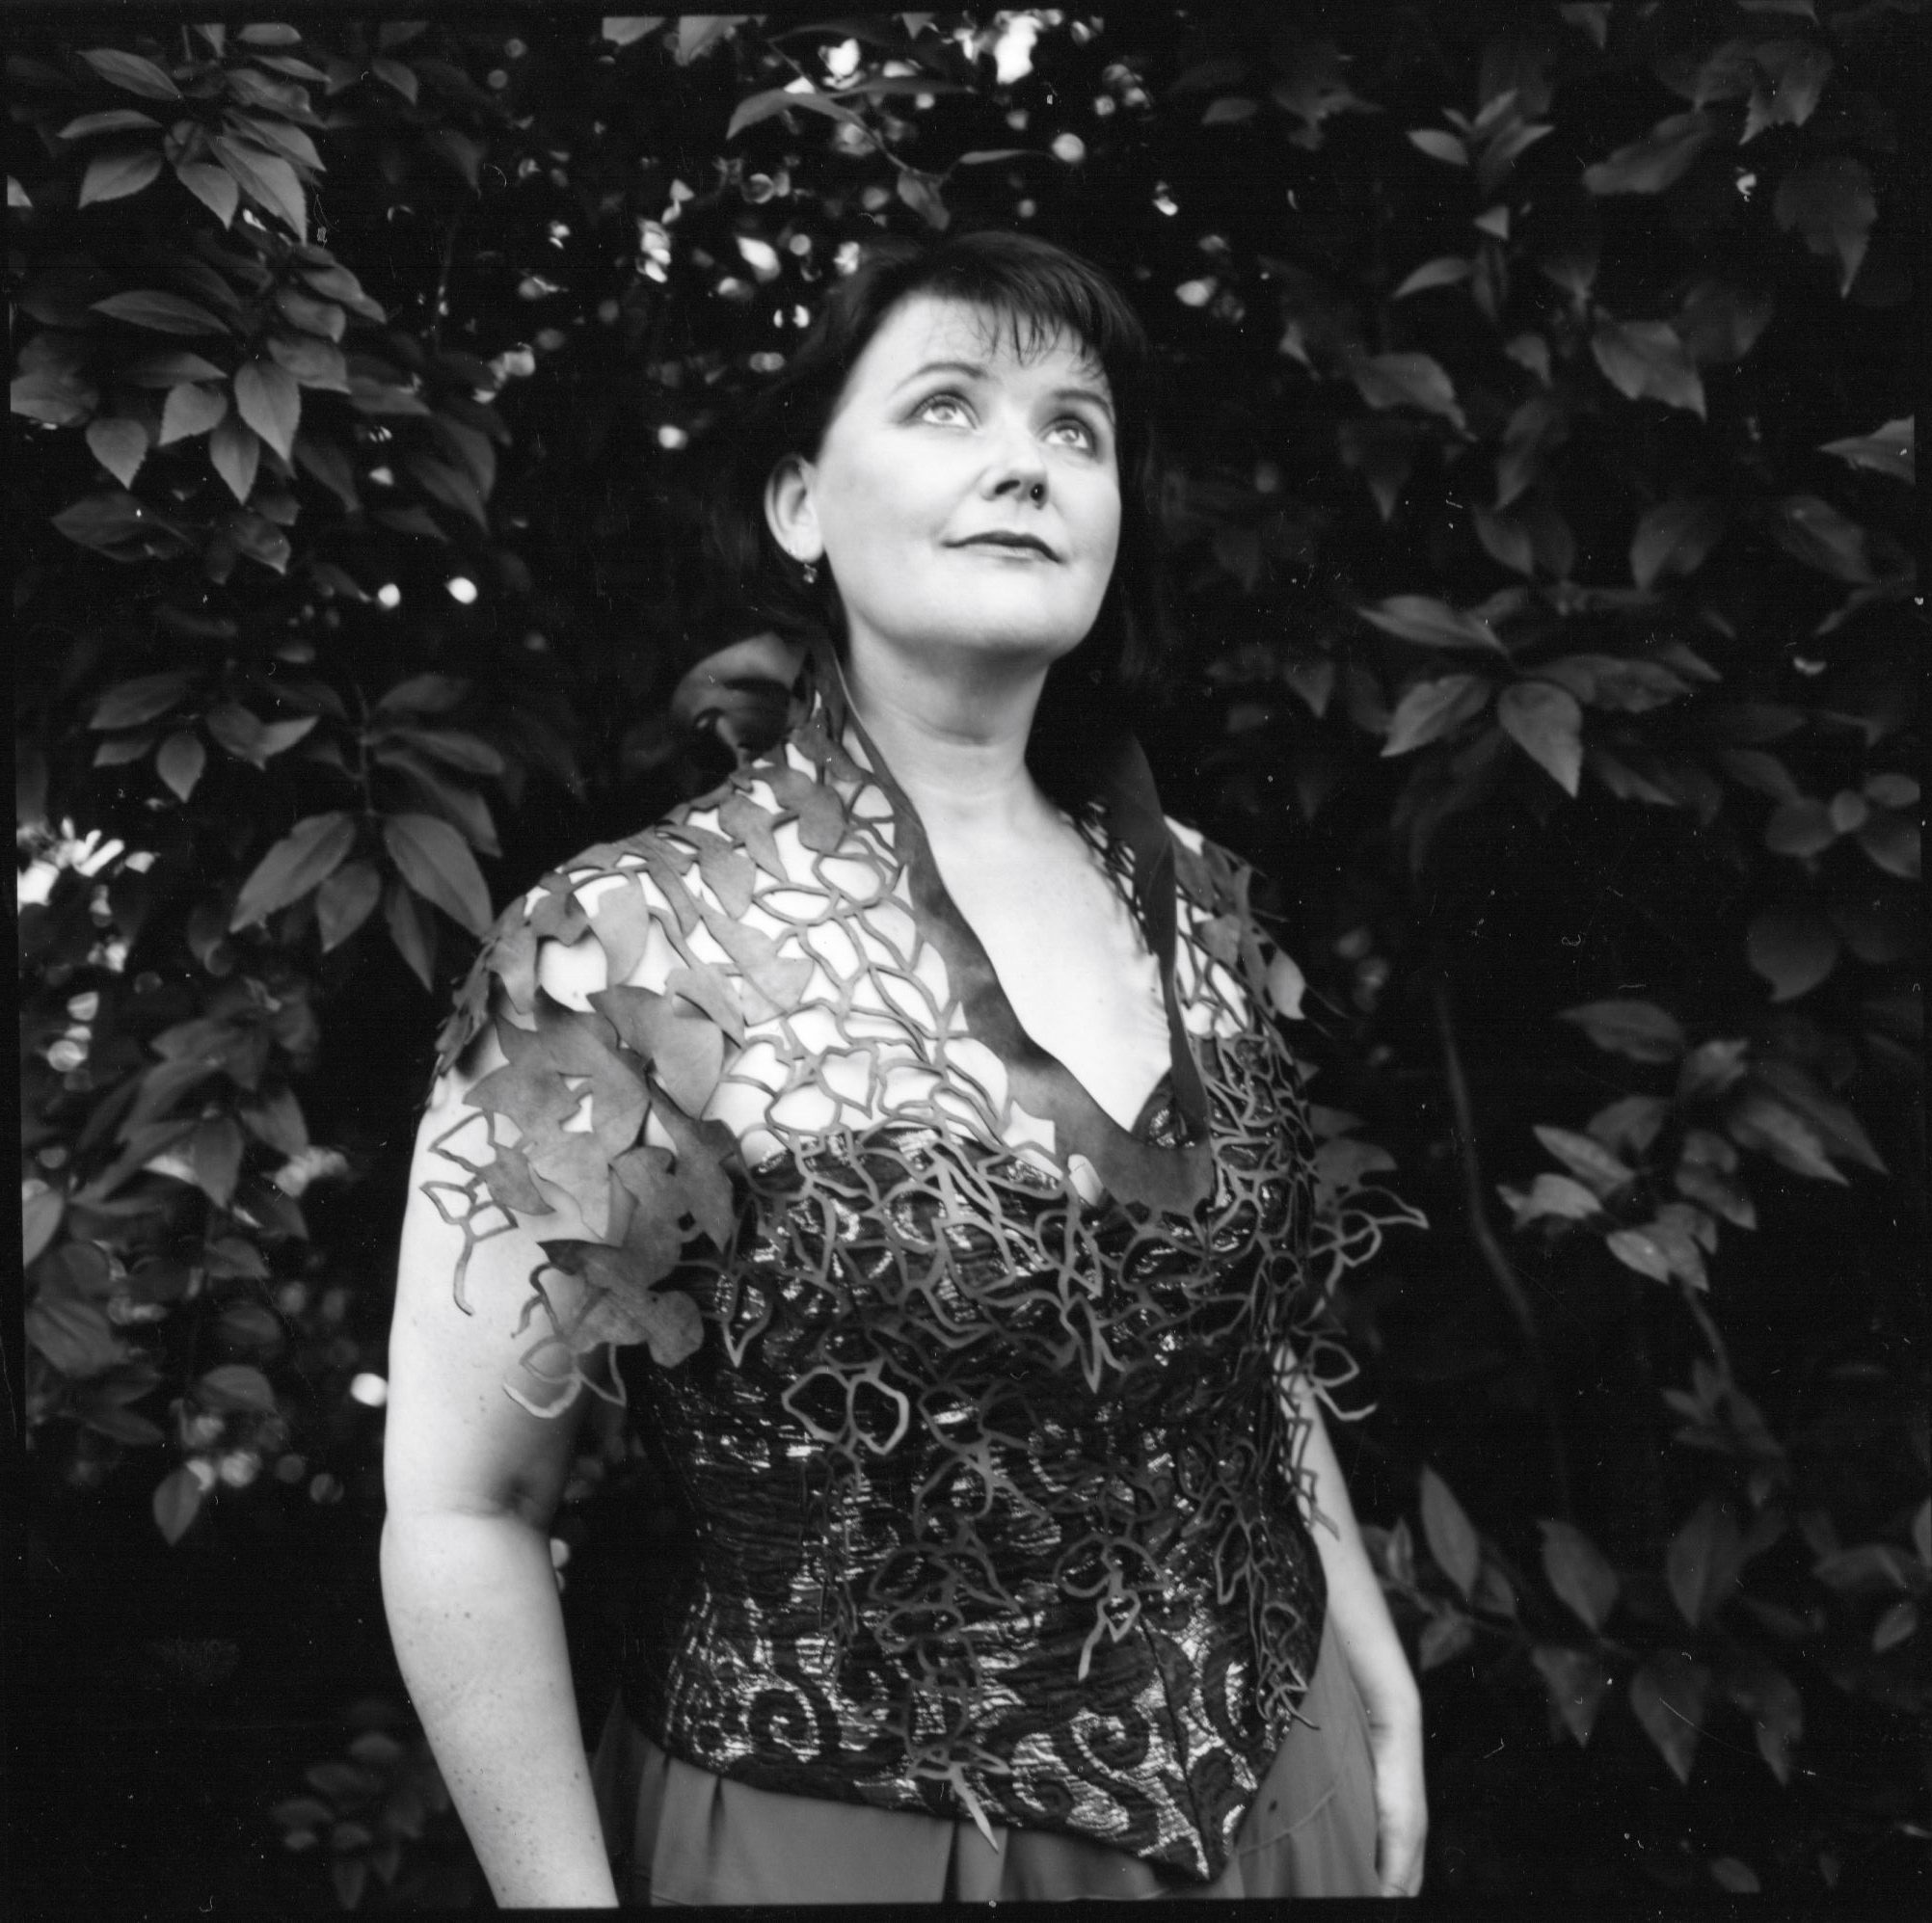 Thea Tolsma, halssieraad, 1997. Foto Duco de Vries, rubber